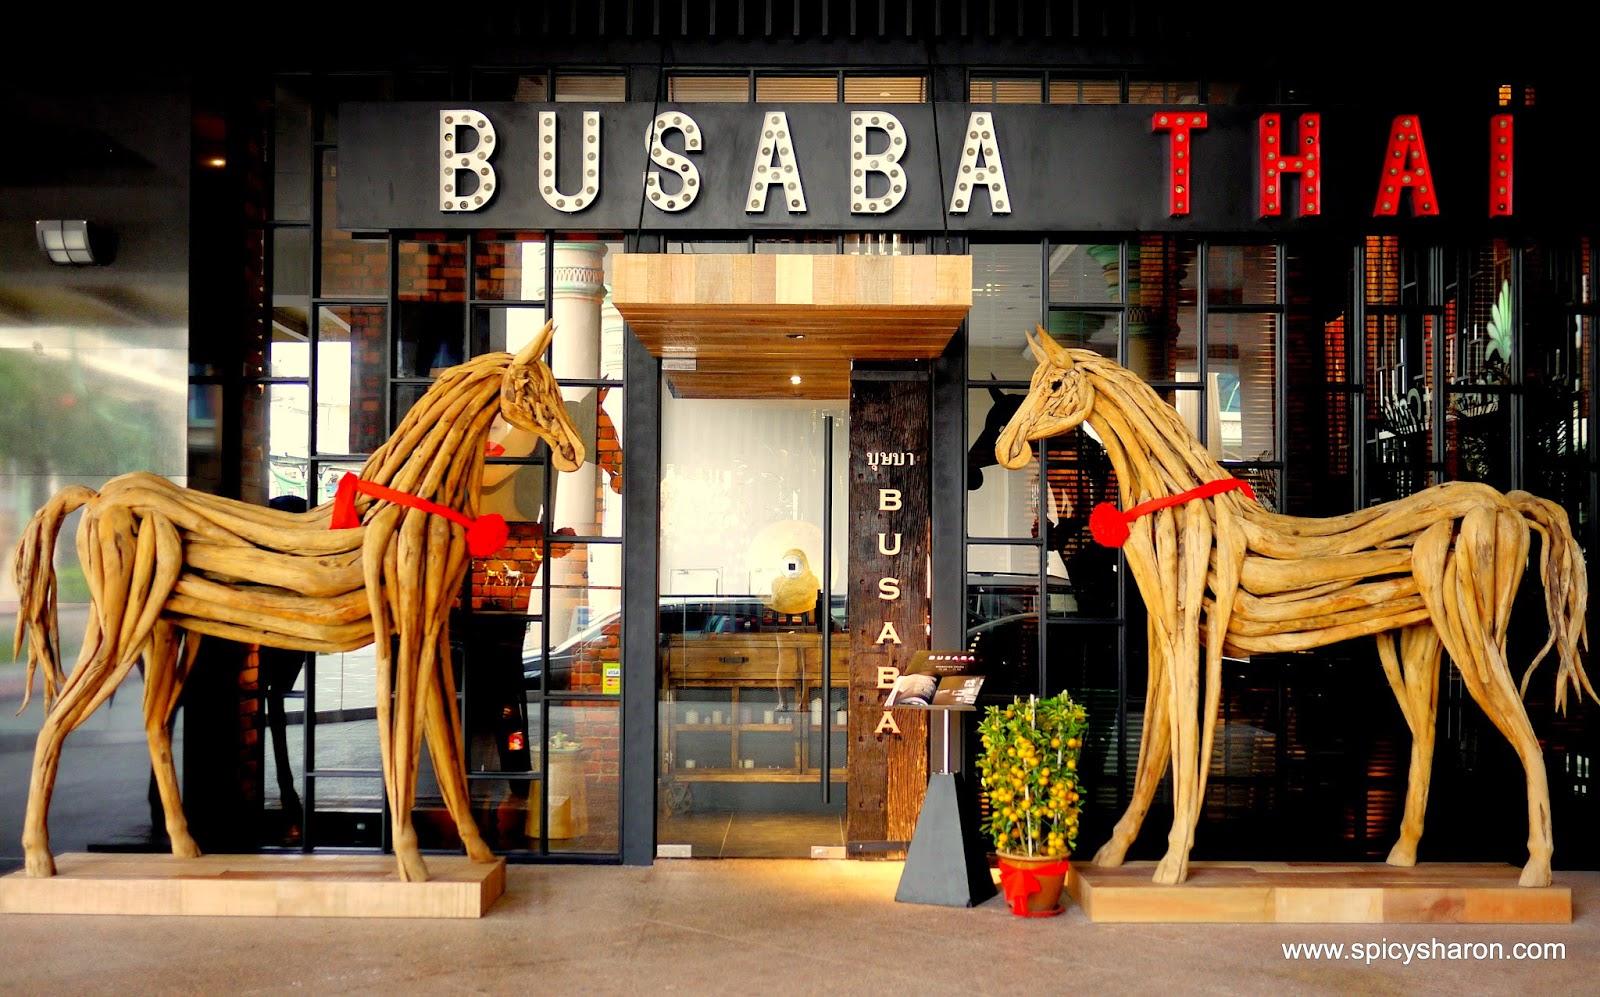 Busaba BSC